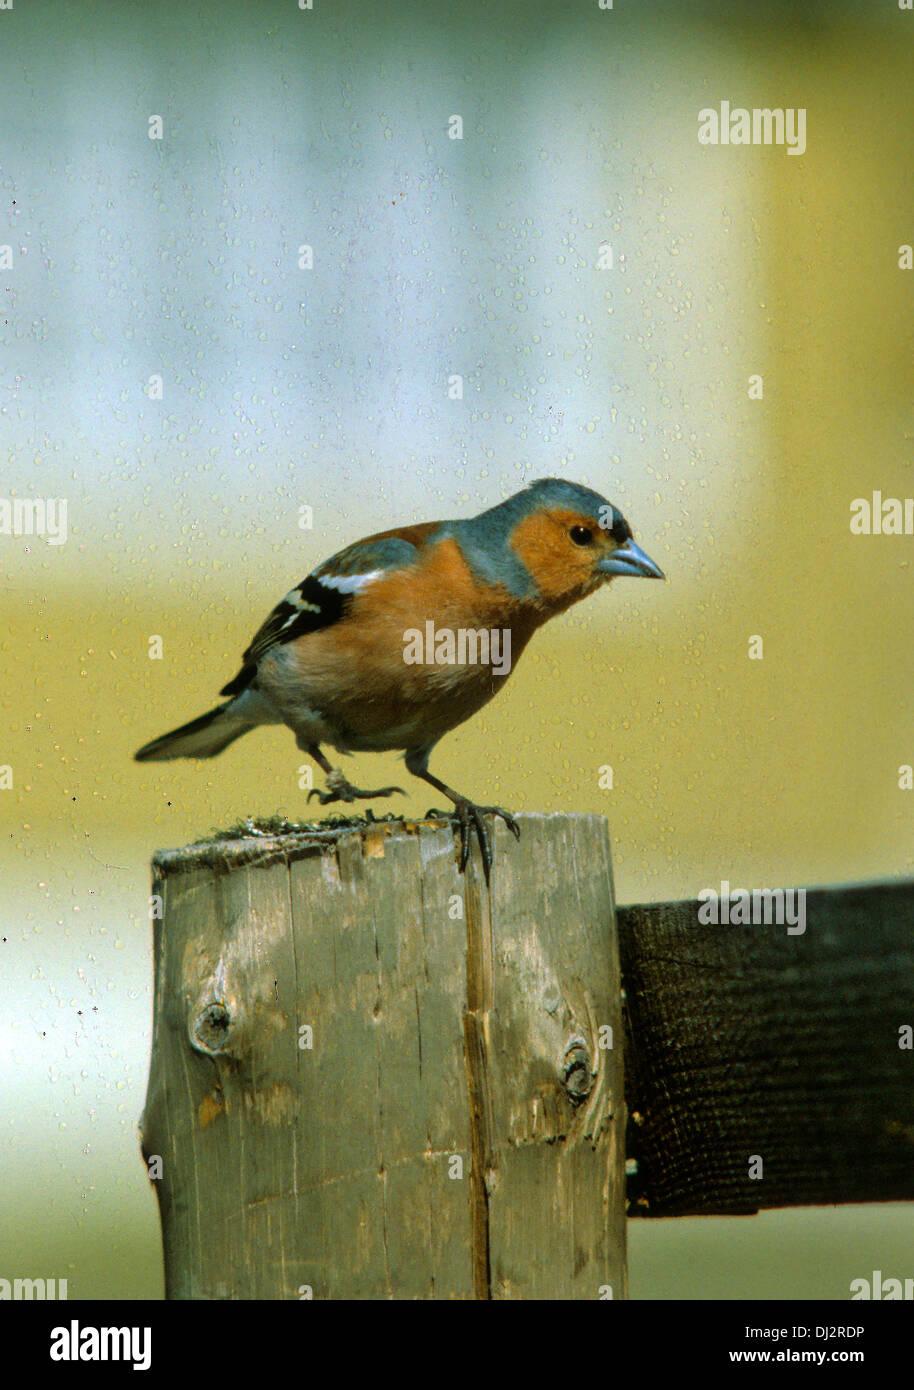 Common Chaffinch (Fringilla coelebs), Chaffinch, Buchfink (Fringilla coelebs) - Stock Image